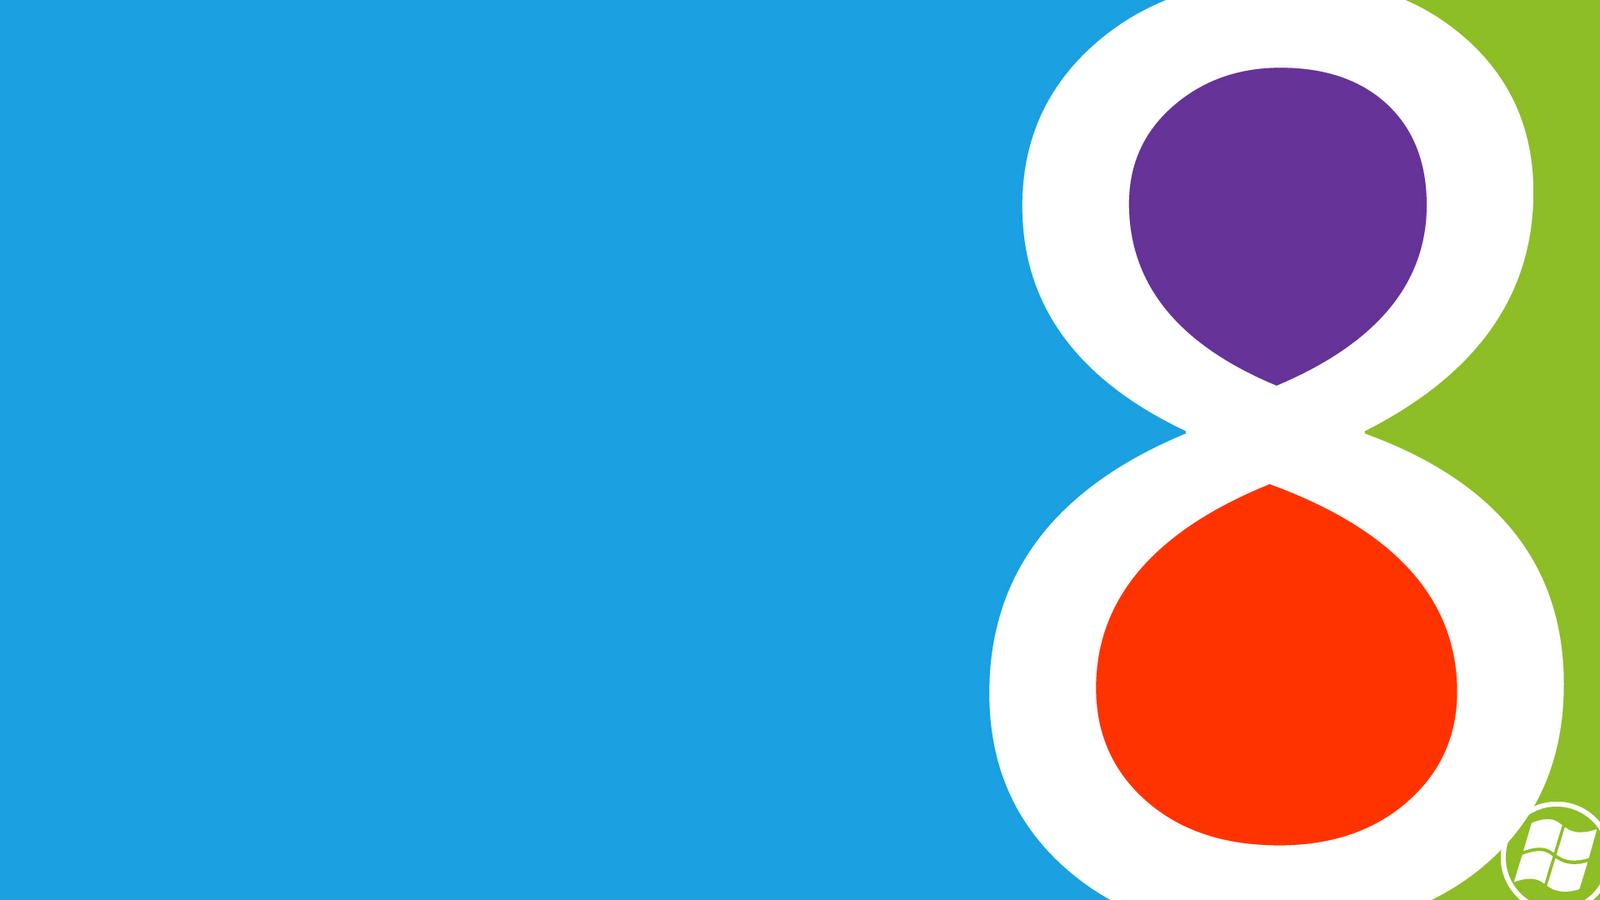 Displaying 16> Images For - Microsoft Windows 8 Logo Png...: galleryhip.com/microsoft-windows-8-logo-png.html